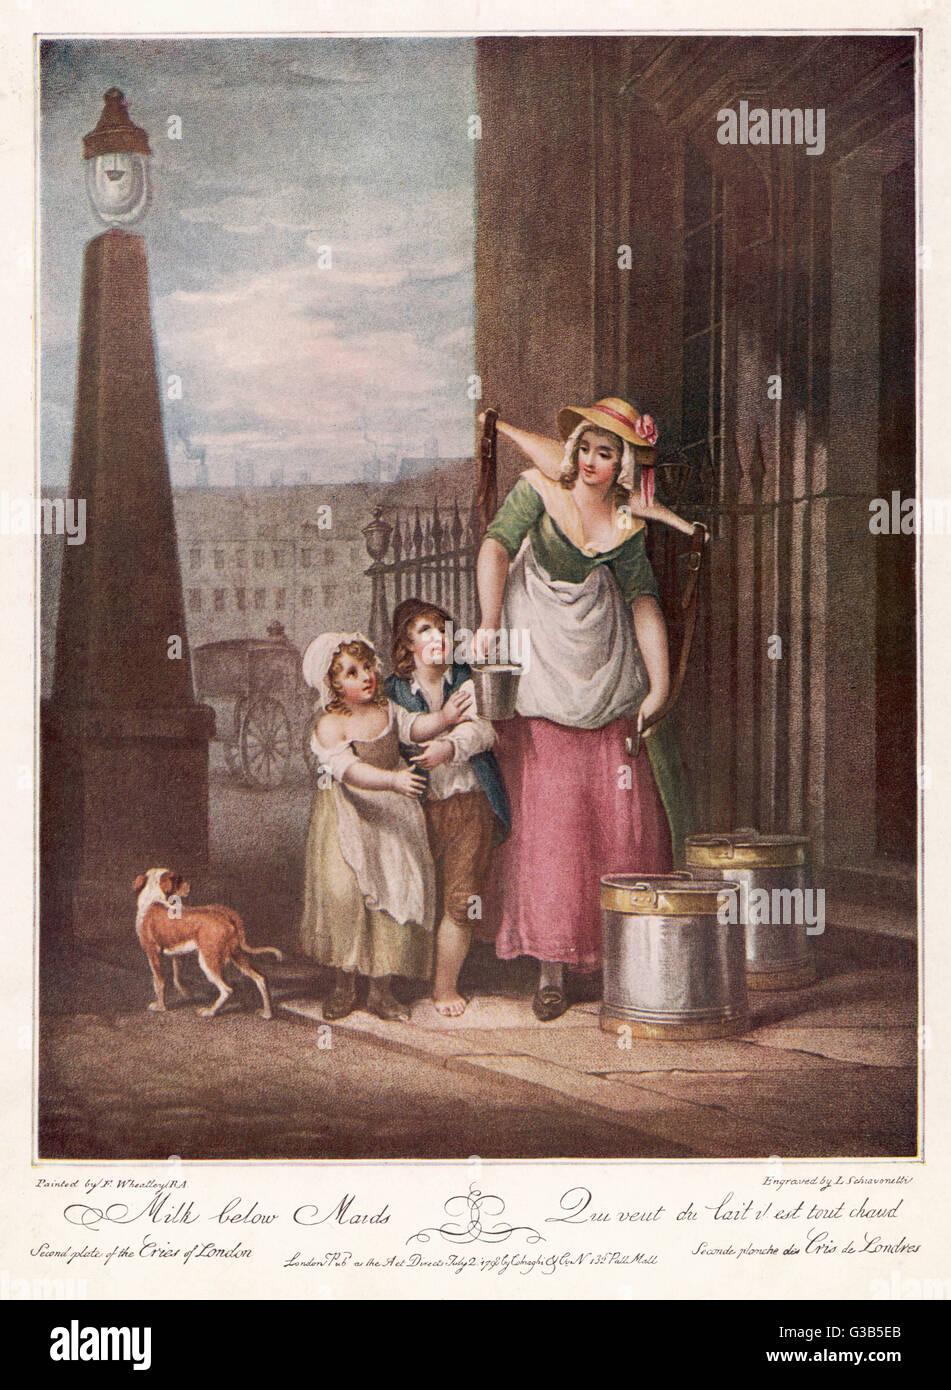 A London milkmaid cries 'Milk  below maids!'        Date: 1798 - Stock Image